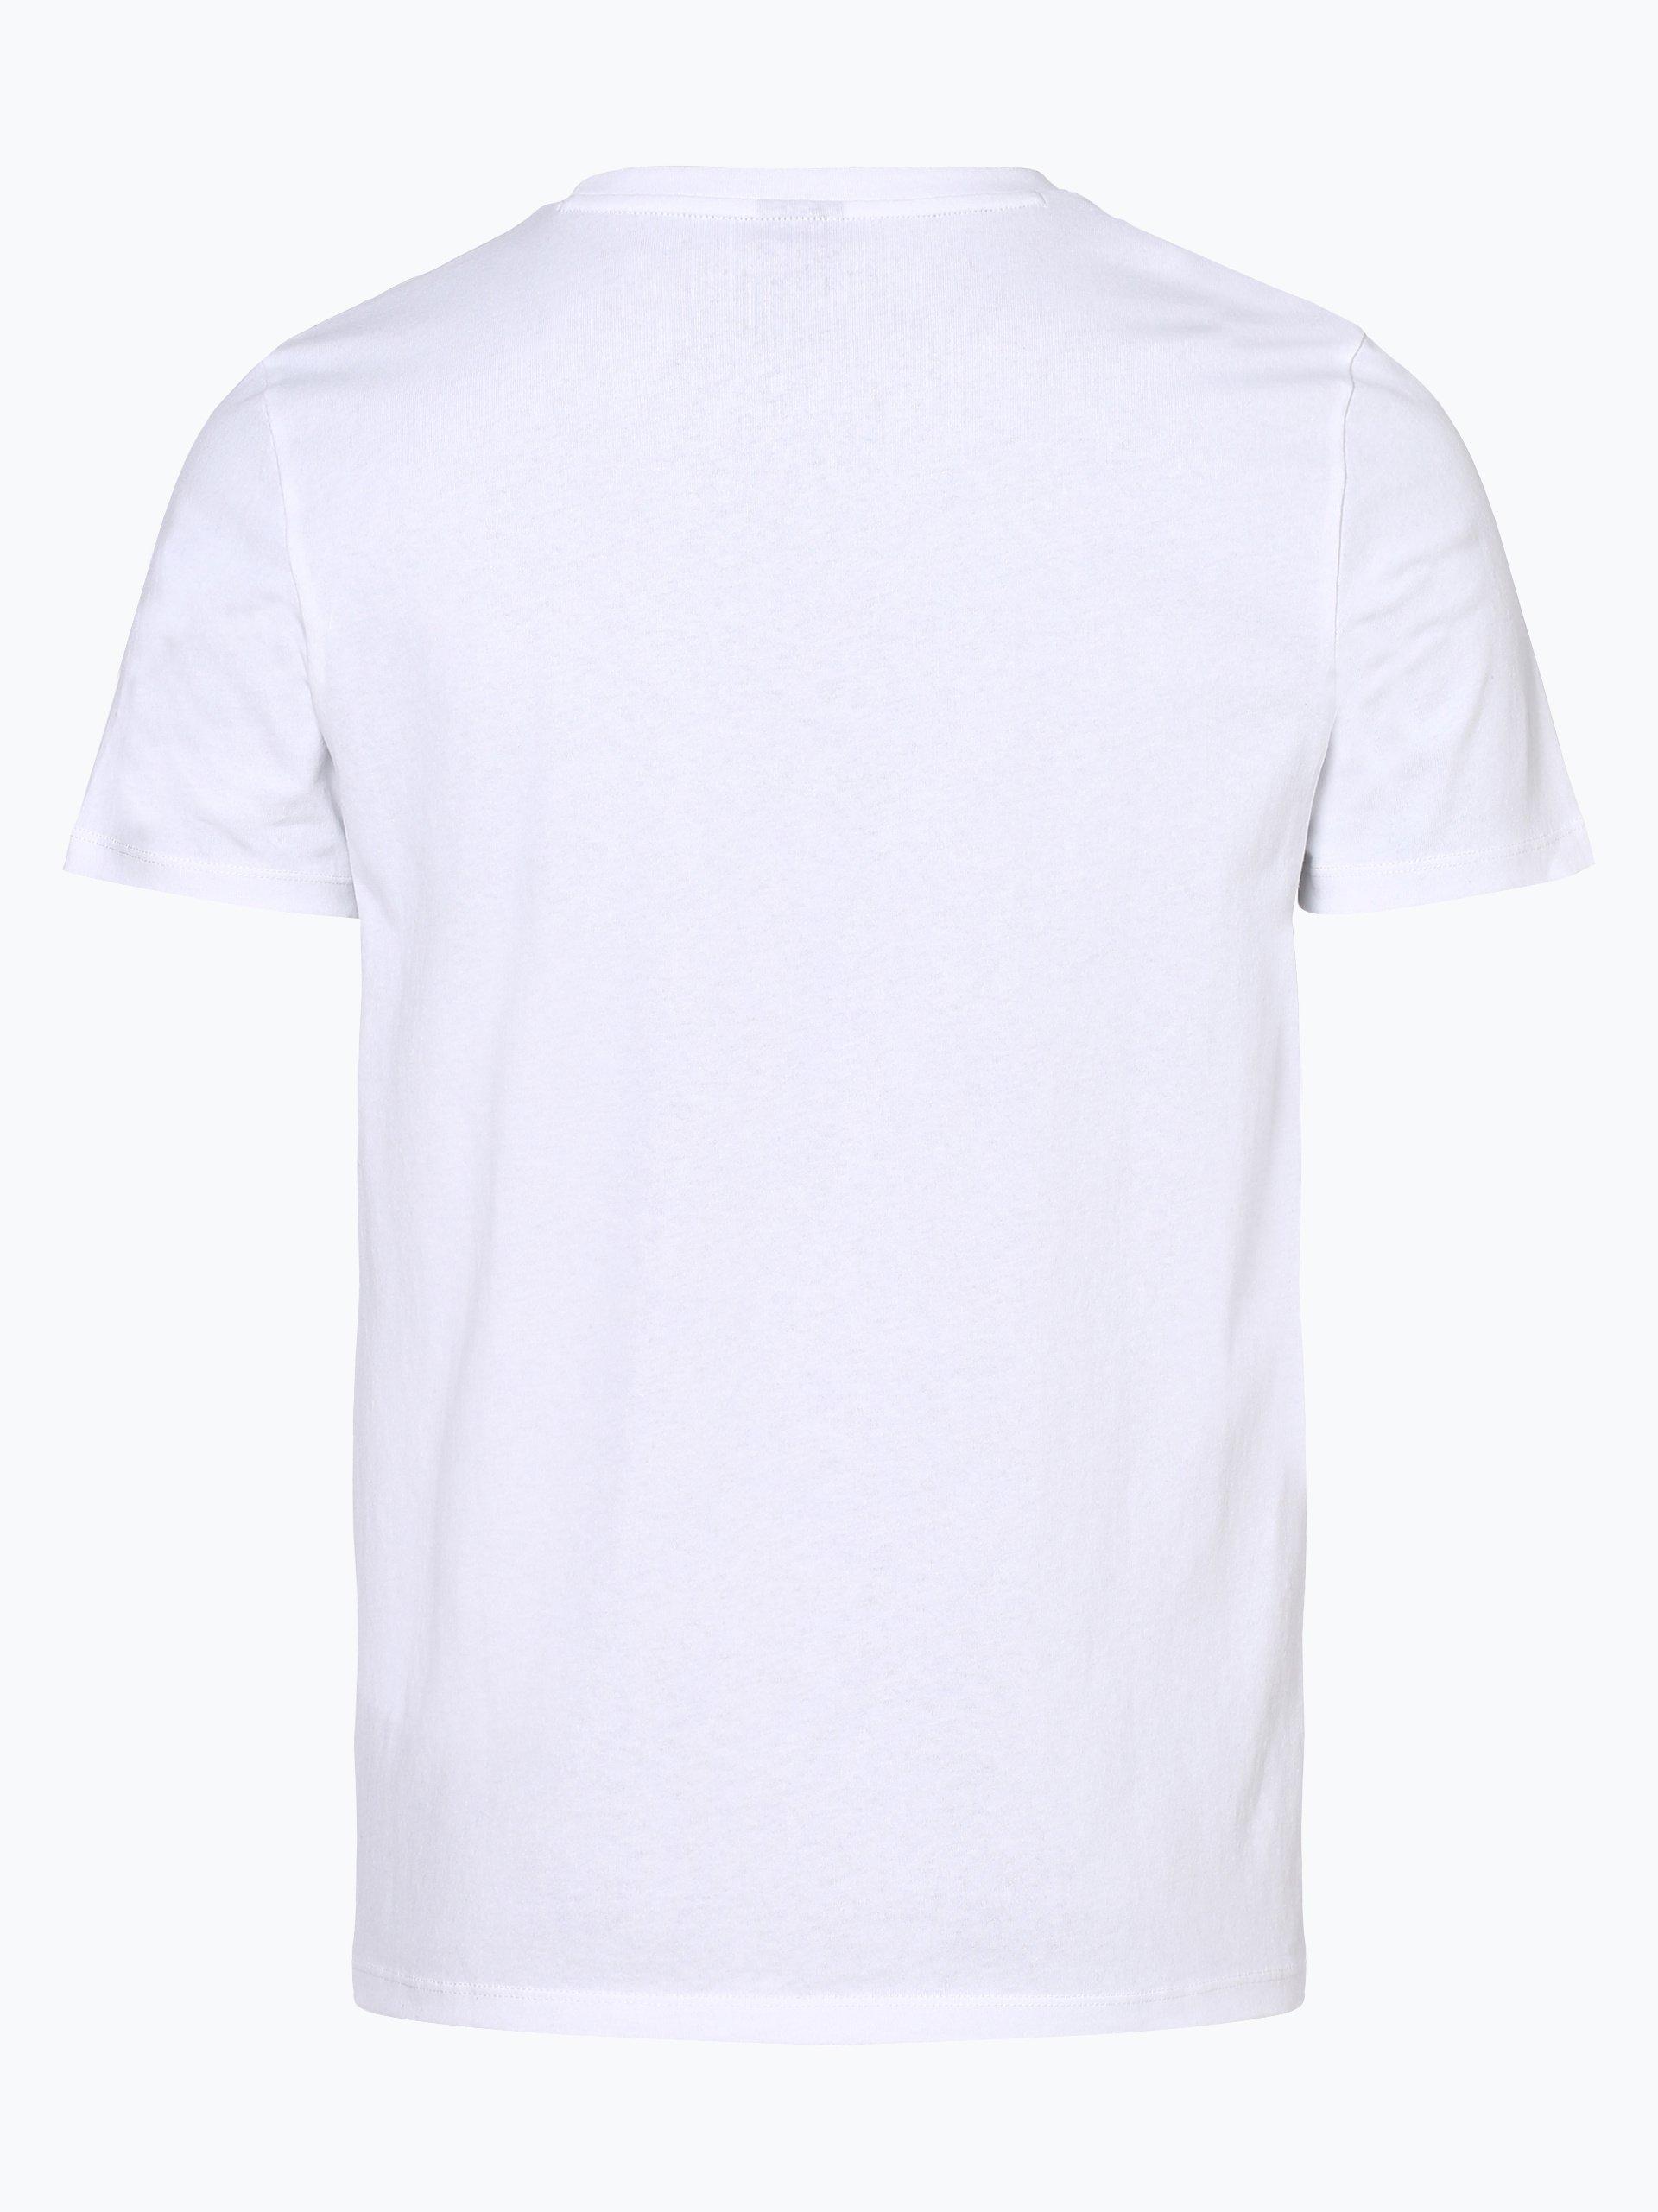 BOSS Casual Herren T-Shirt - Tales